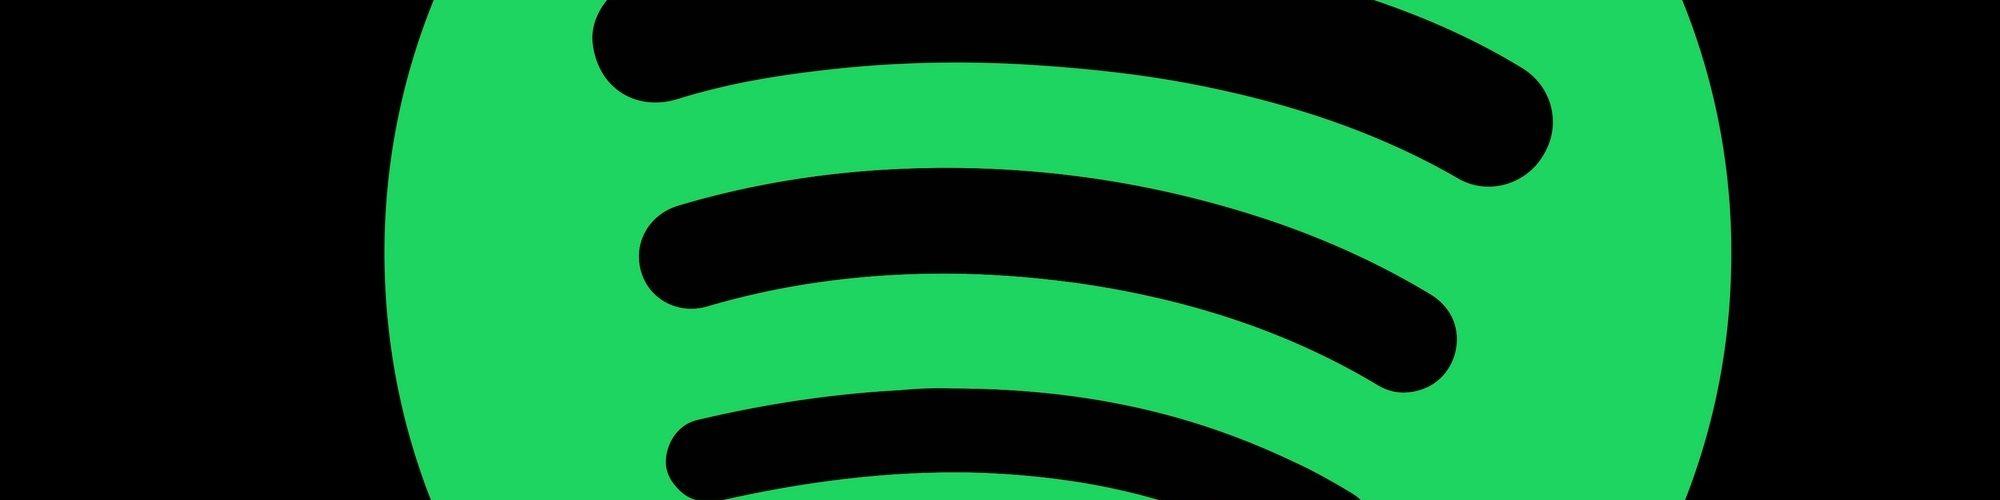 spotify, internet, streaming